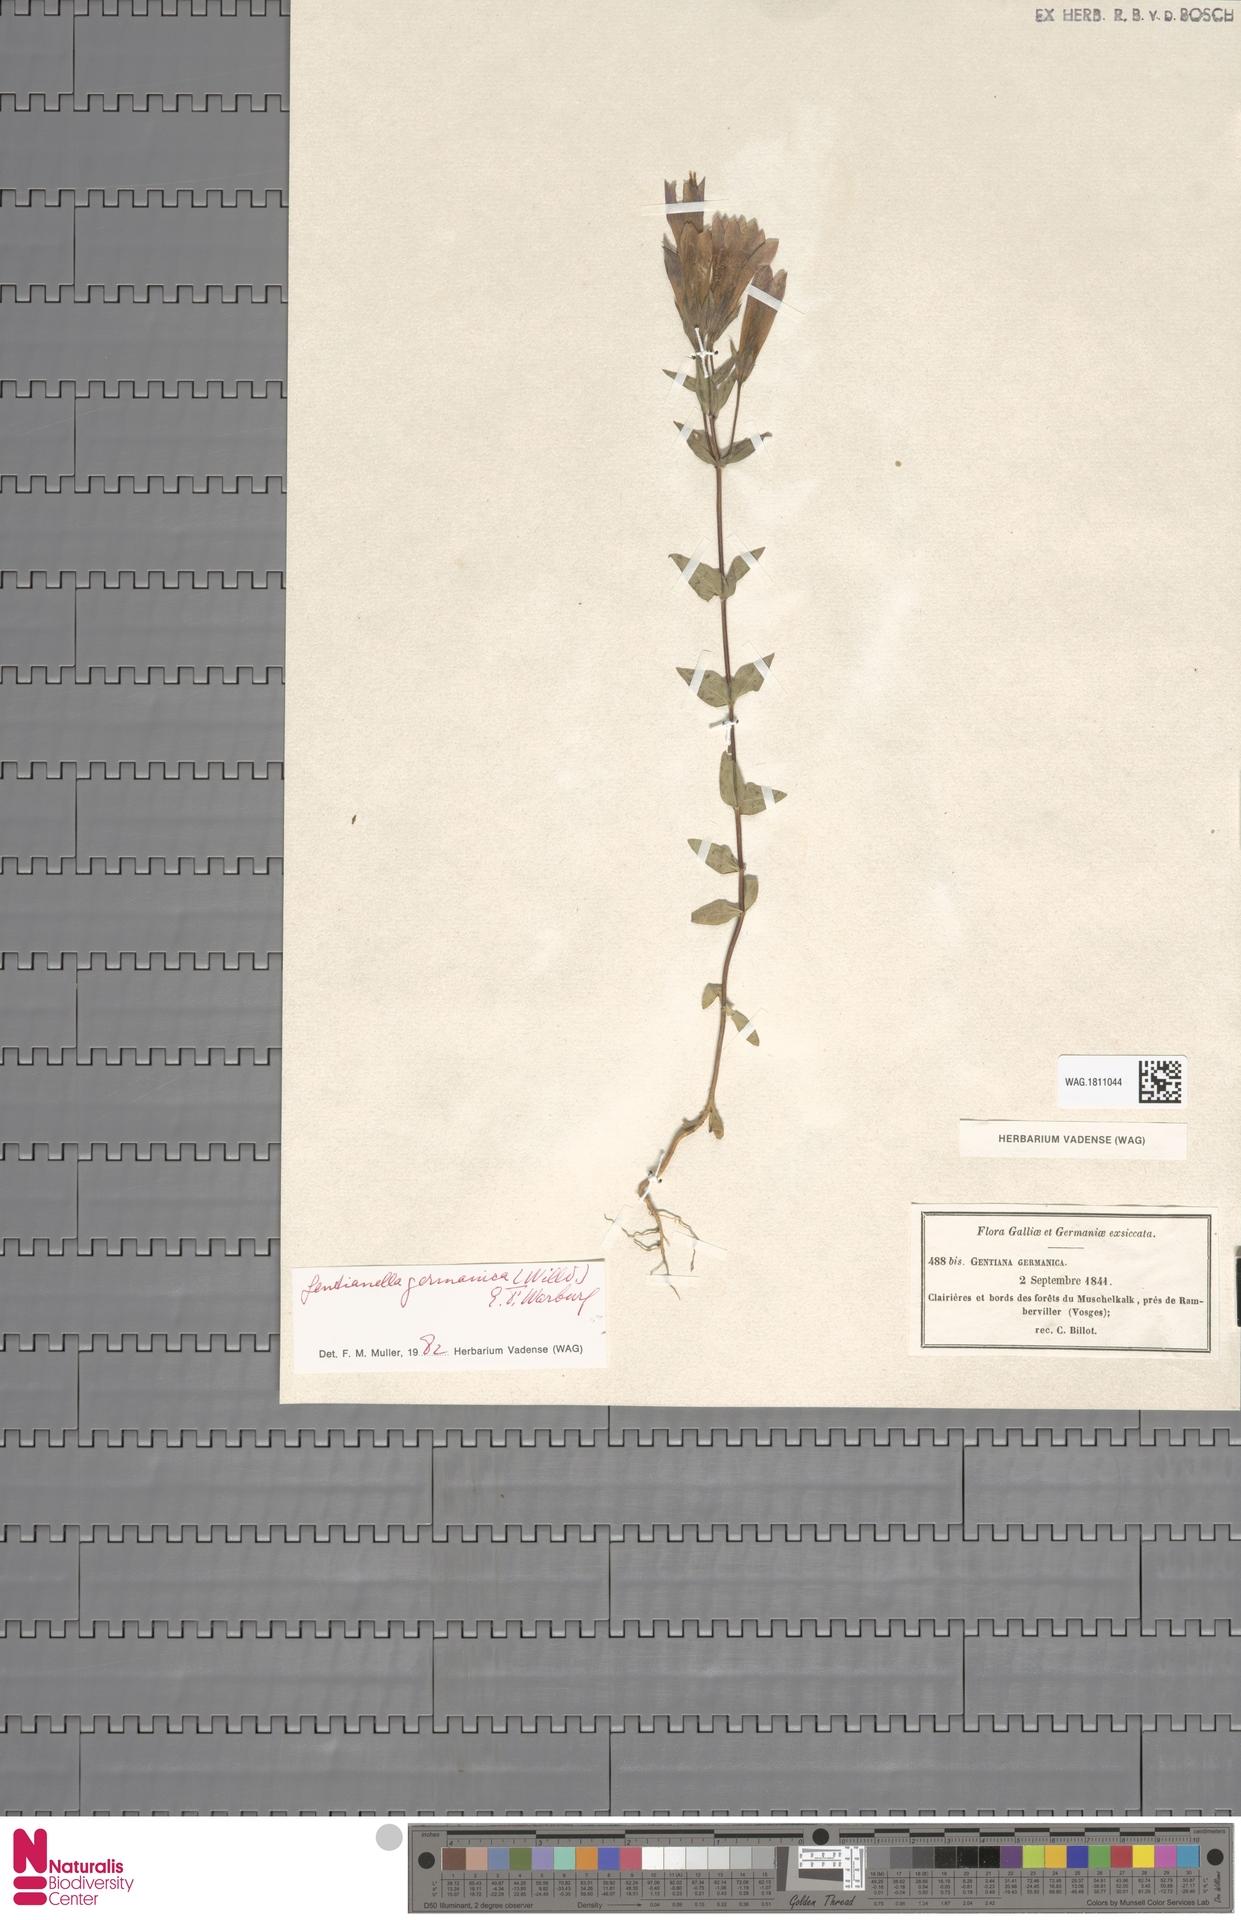 WAG.1811044   Gentianella germanica (Willd.) E.F.Warb.